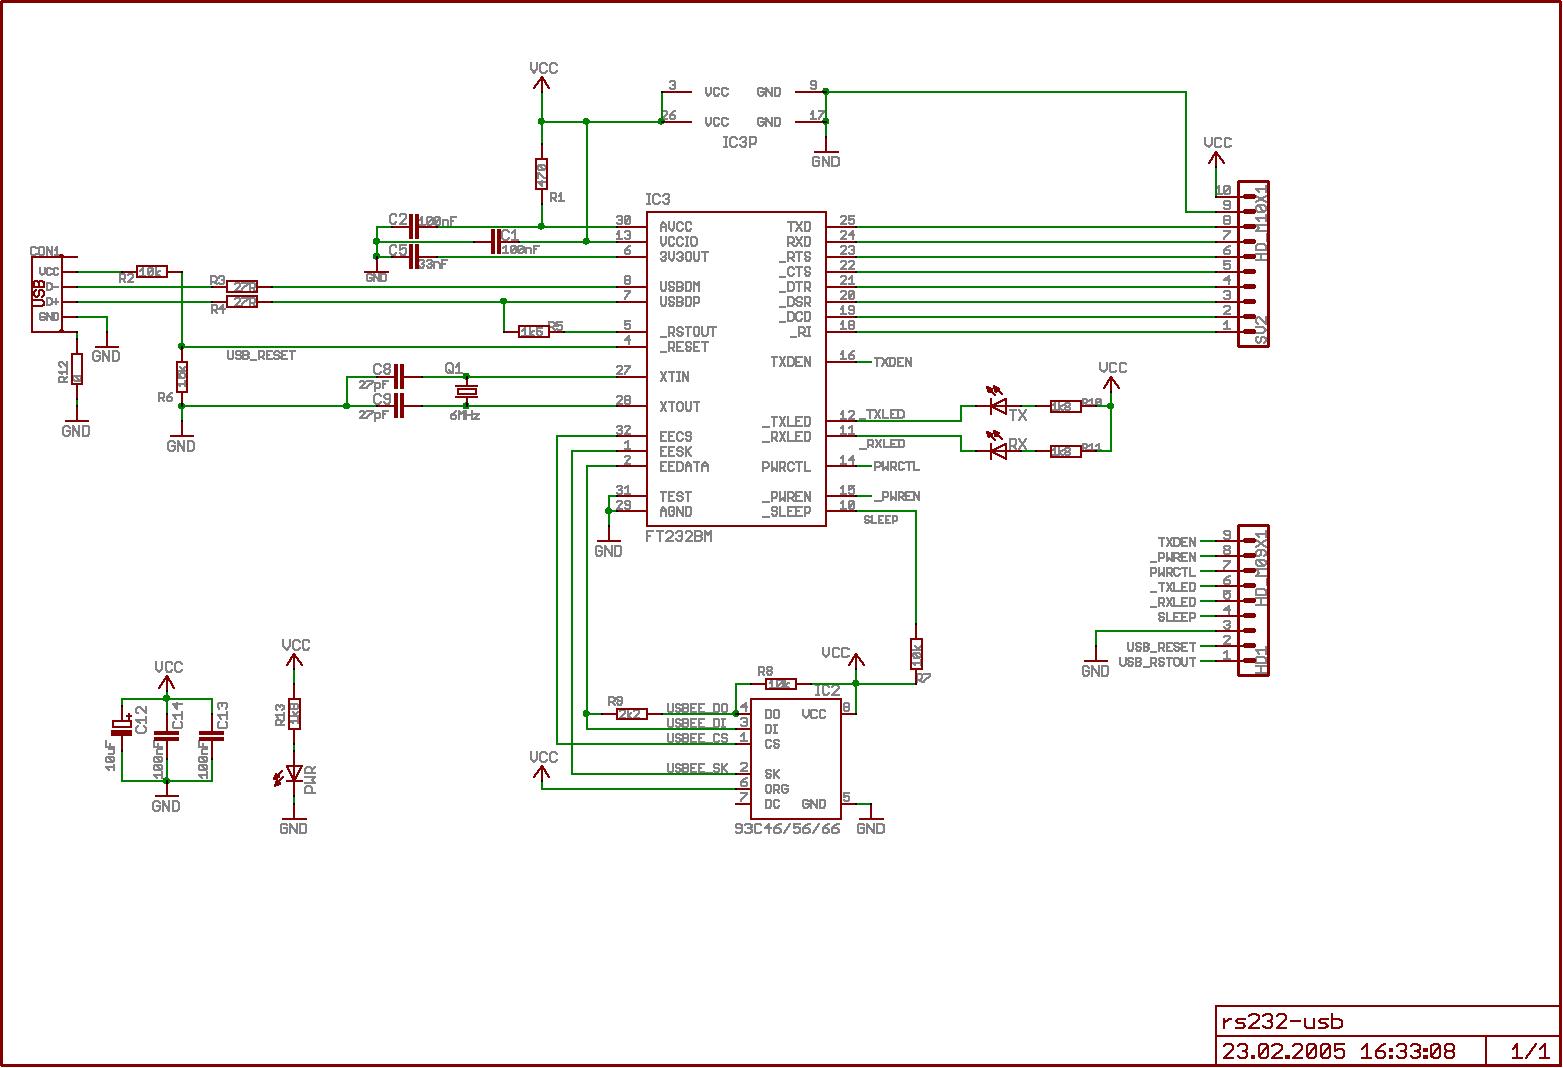 Outstanding Usb To Rs232 Adapter With Ft232 Wiring Cloud Biosomenaidewilluminateatxorg